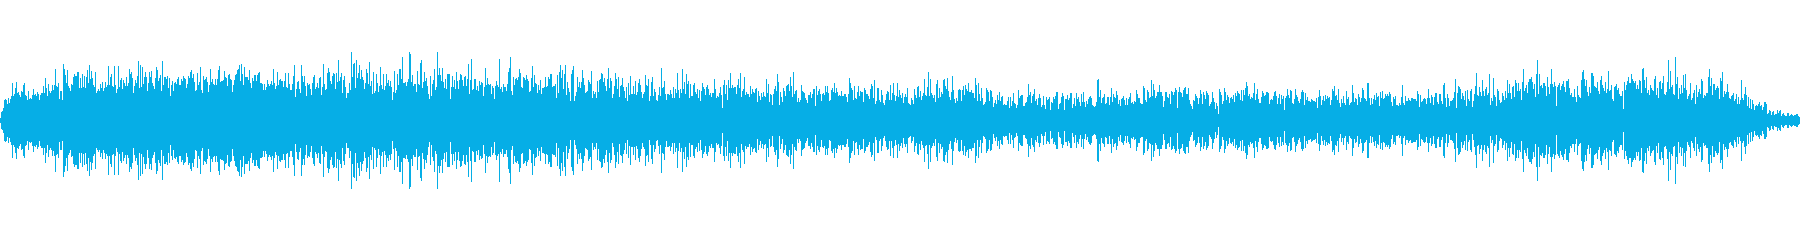 VRカラム、スペーストランスポータ...の再生済みの波形